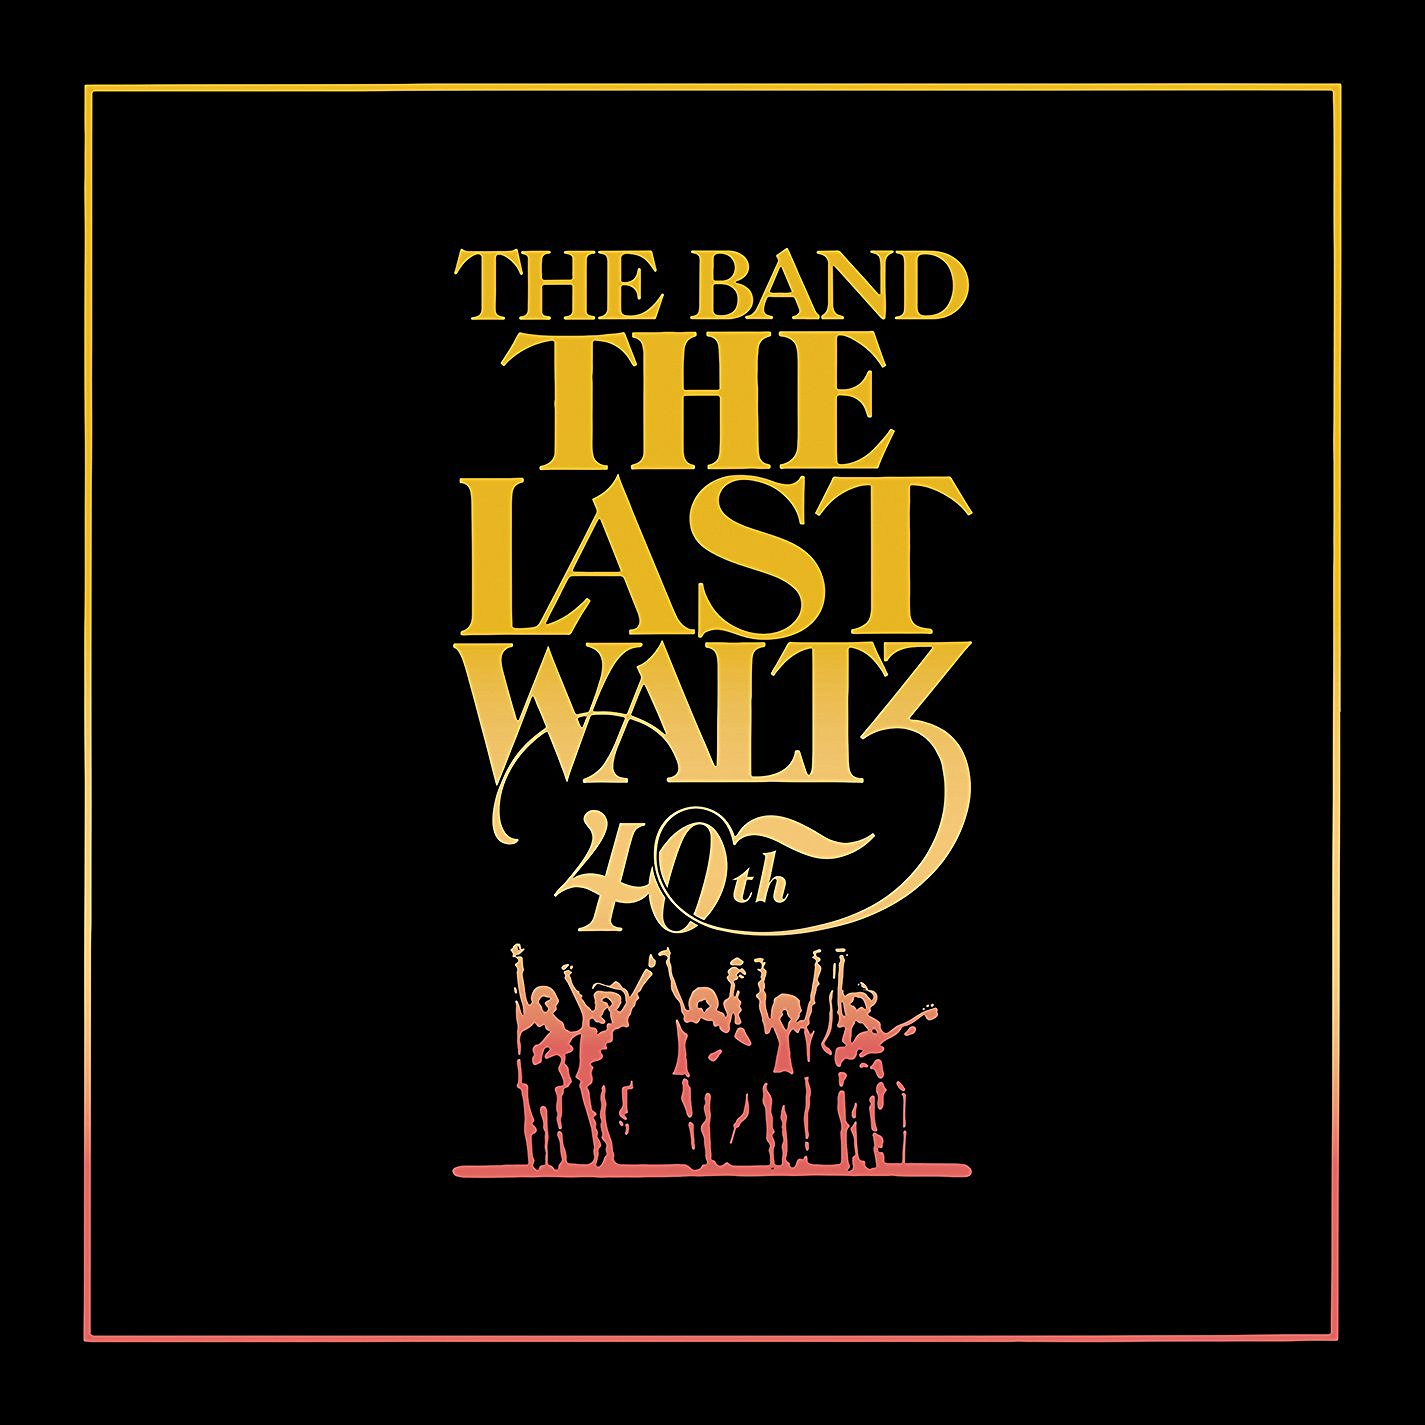 The Last Waltz 40th Anniversary Deluxe Edition